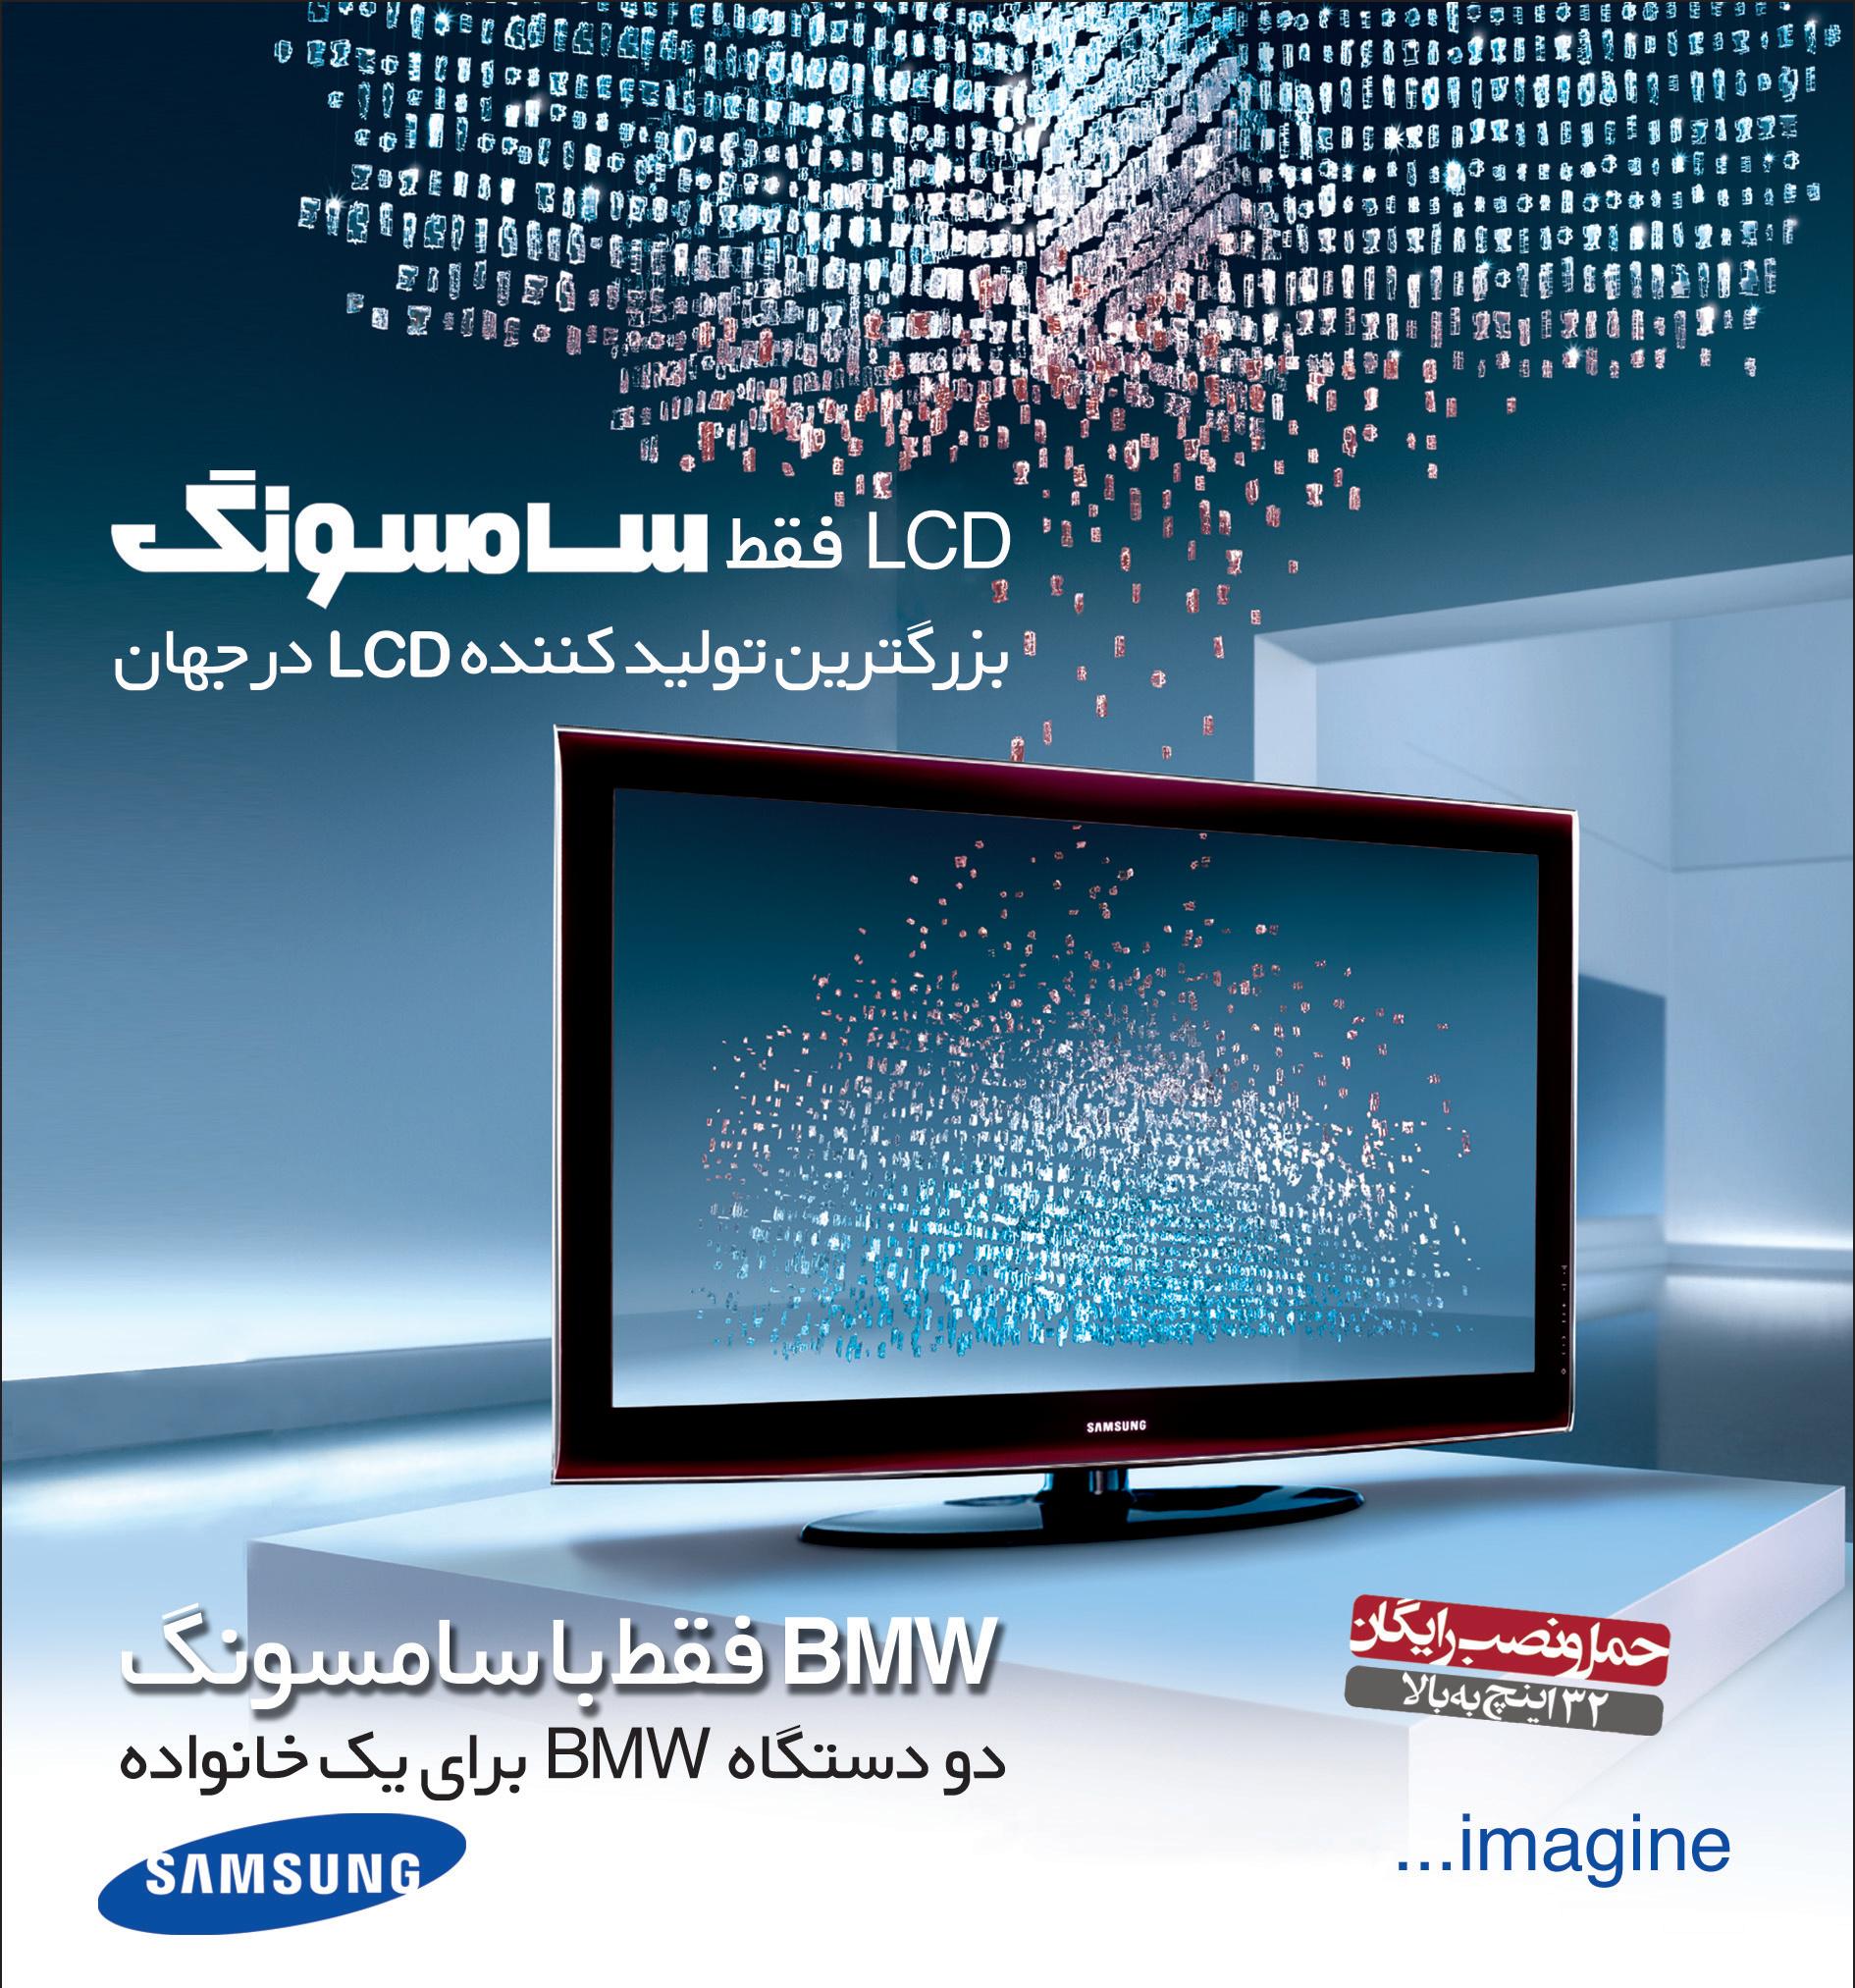 LCD Samsung (87.04.04)